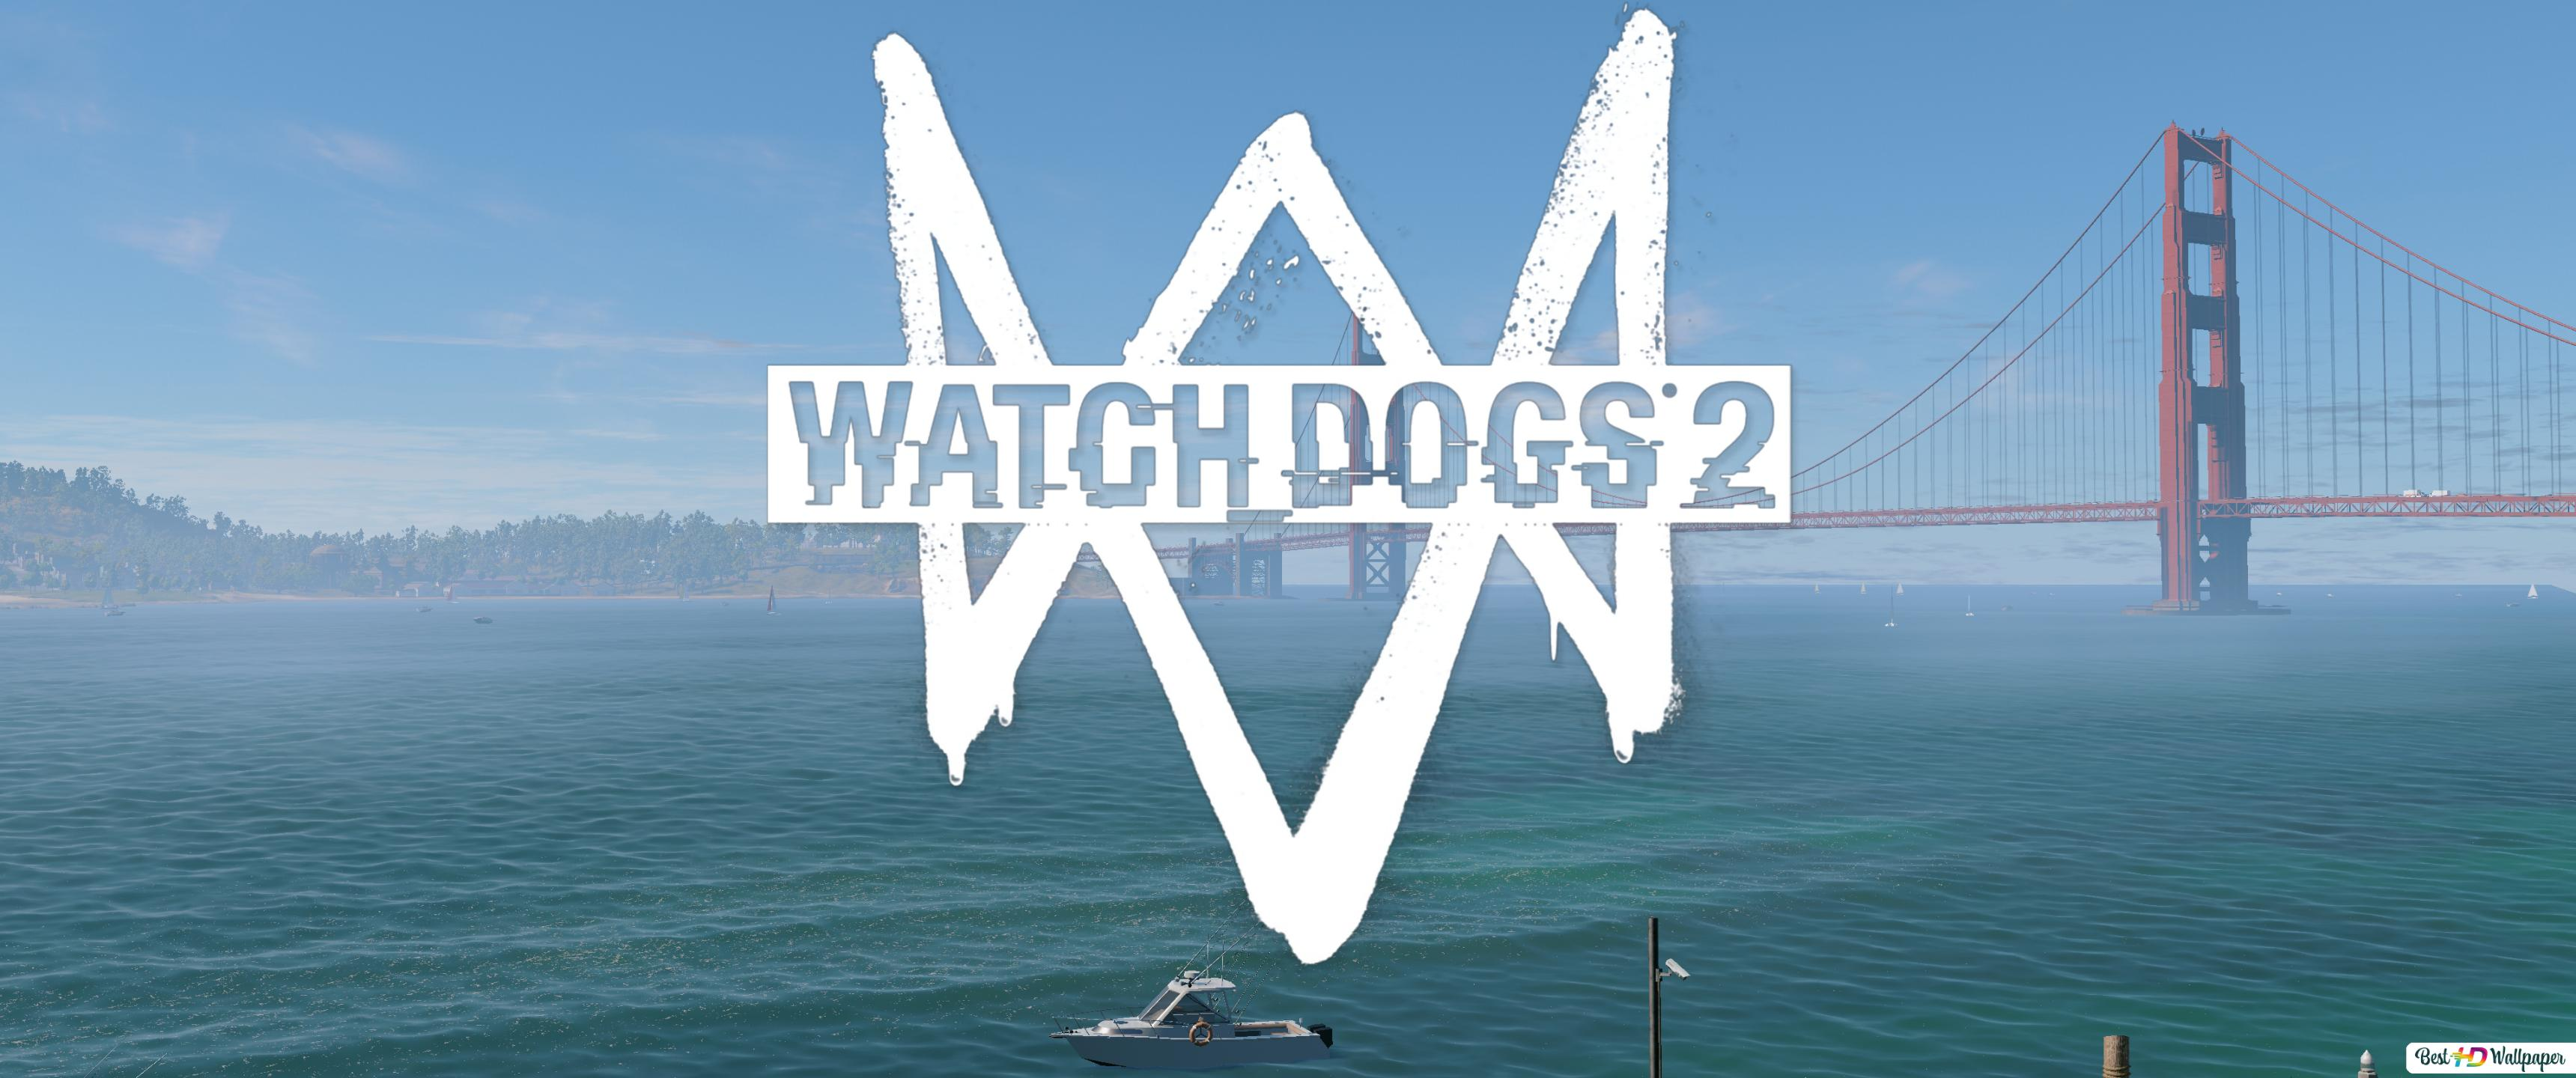 Descargar Fondo De Pantalla San Francisco En Watch Dogs Hd